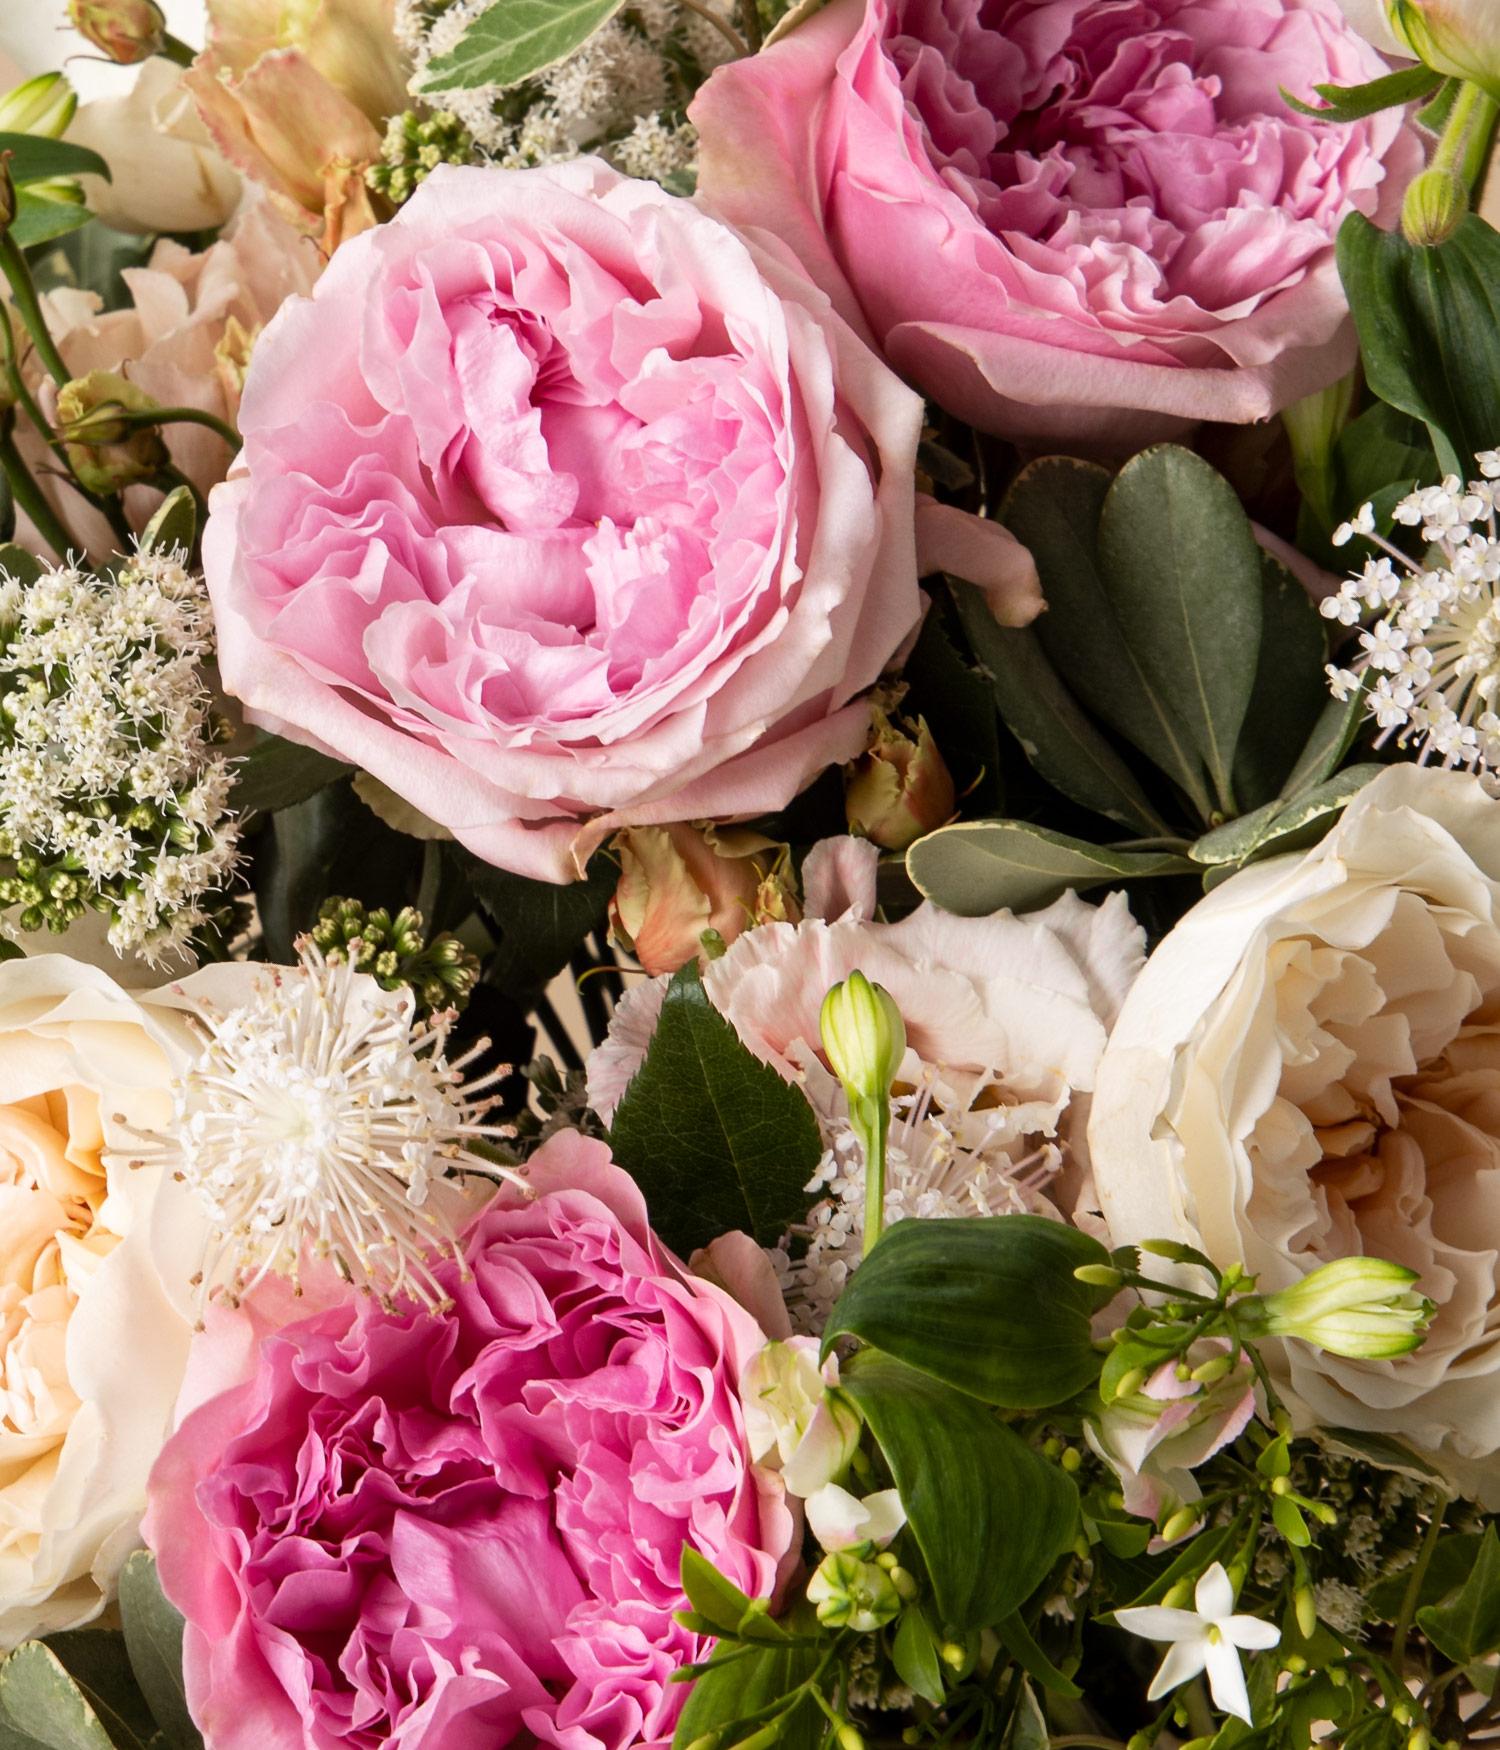 Detail of Garden Rose flower bouquet